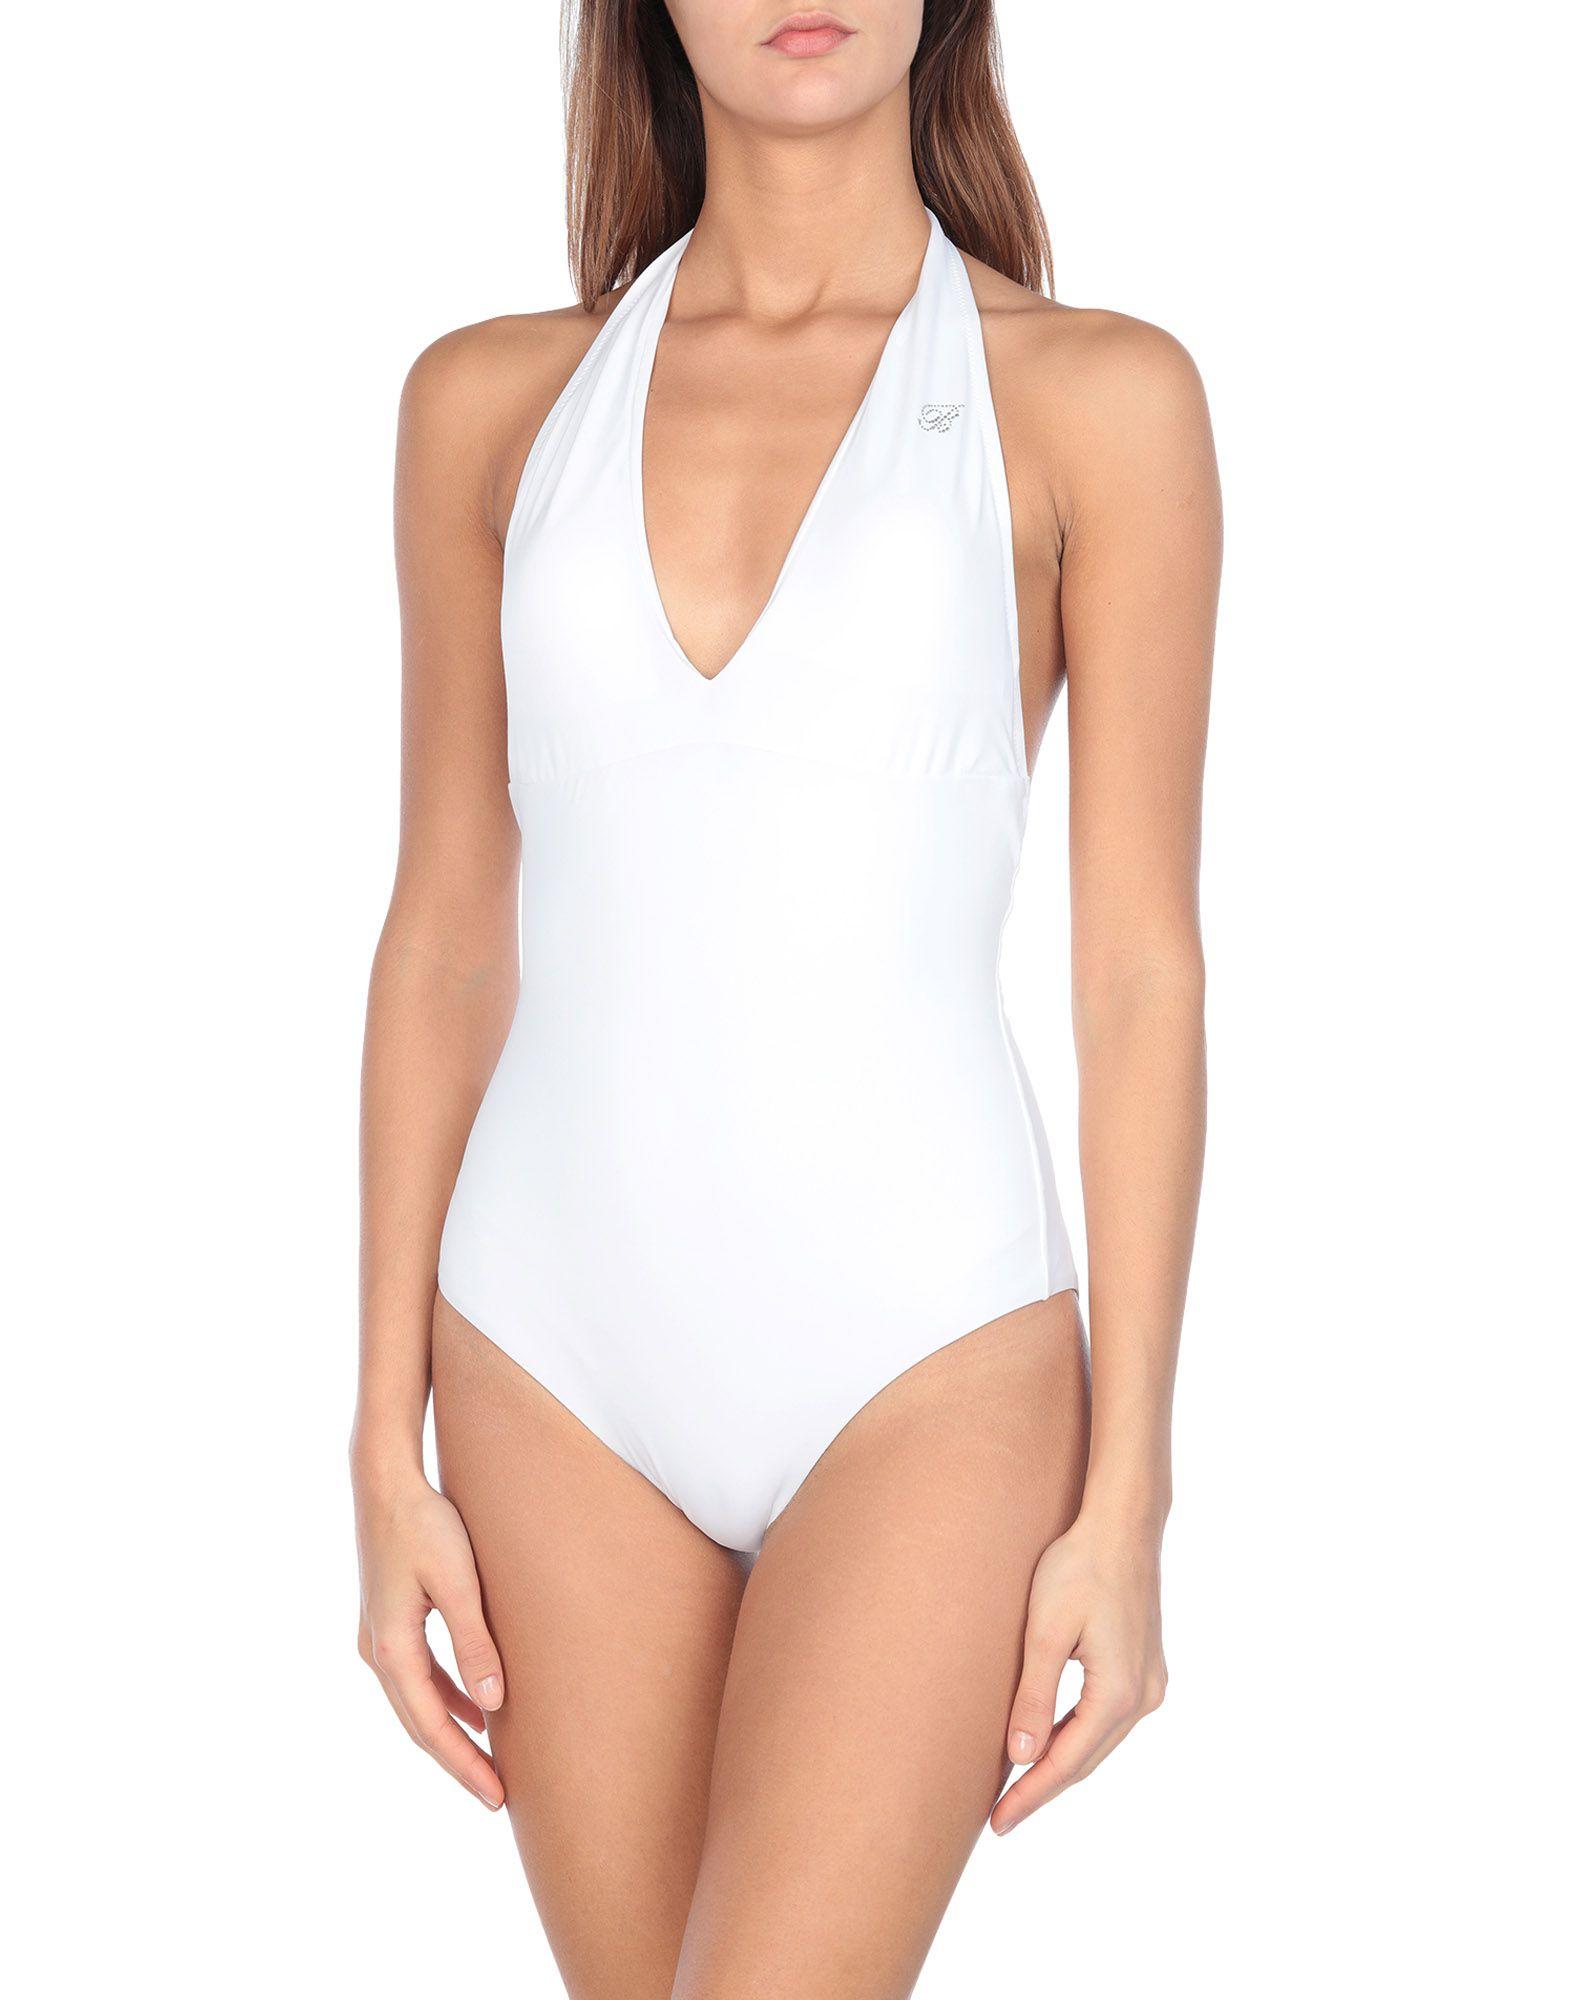 BLUMARINE BEACHWEAR Слитный купальник blugirl blumarine beachwear слитный купальник